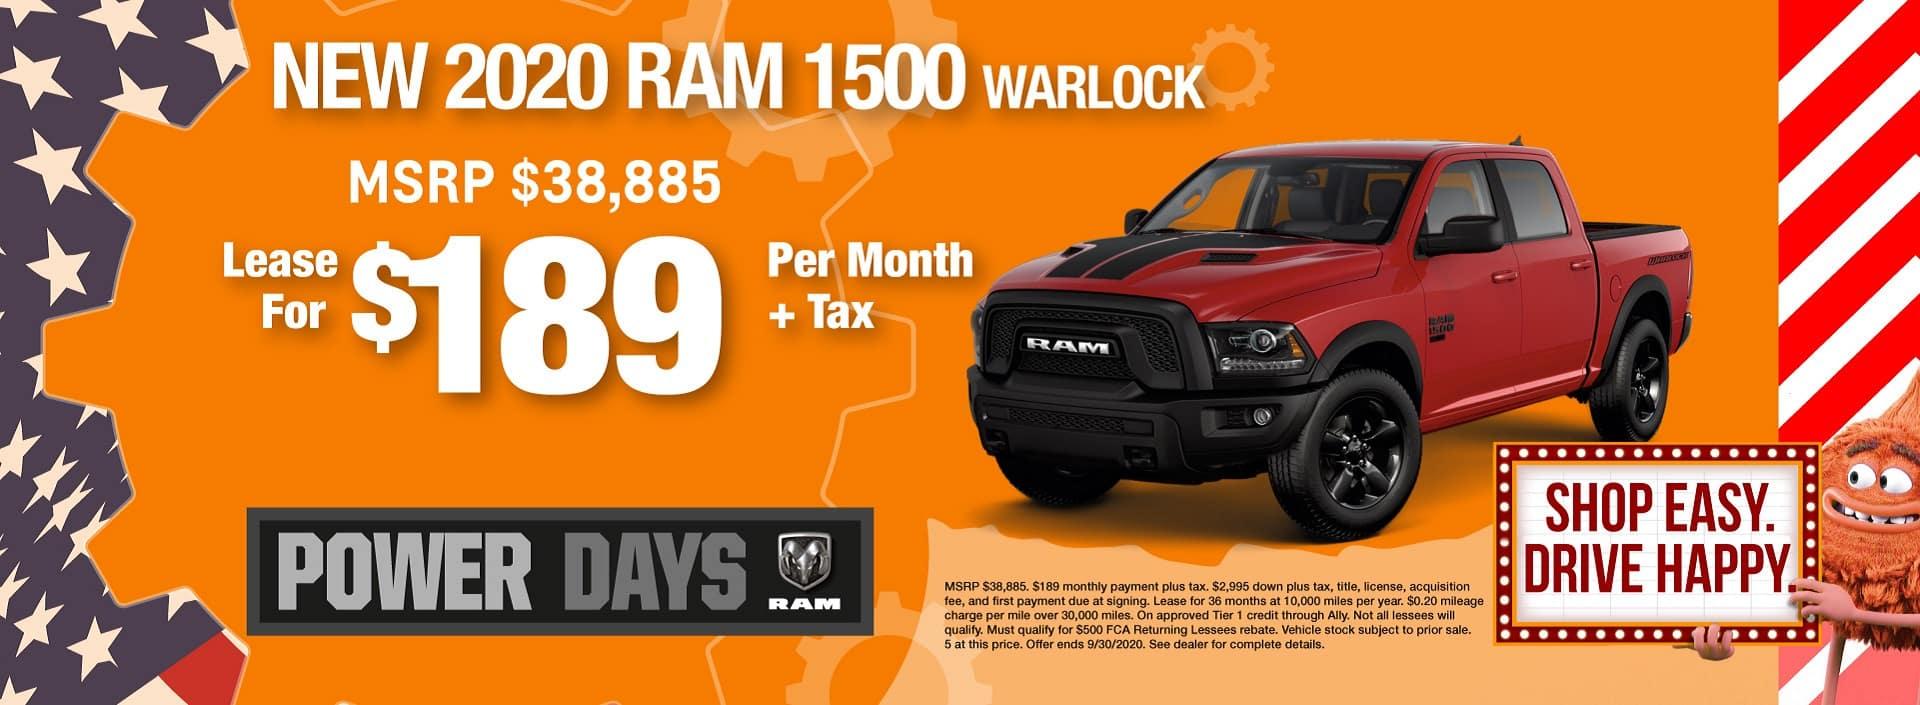 OC 1920px705 Offers_Sep30_1500 Warlock